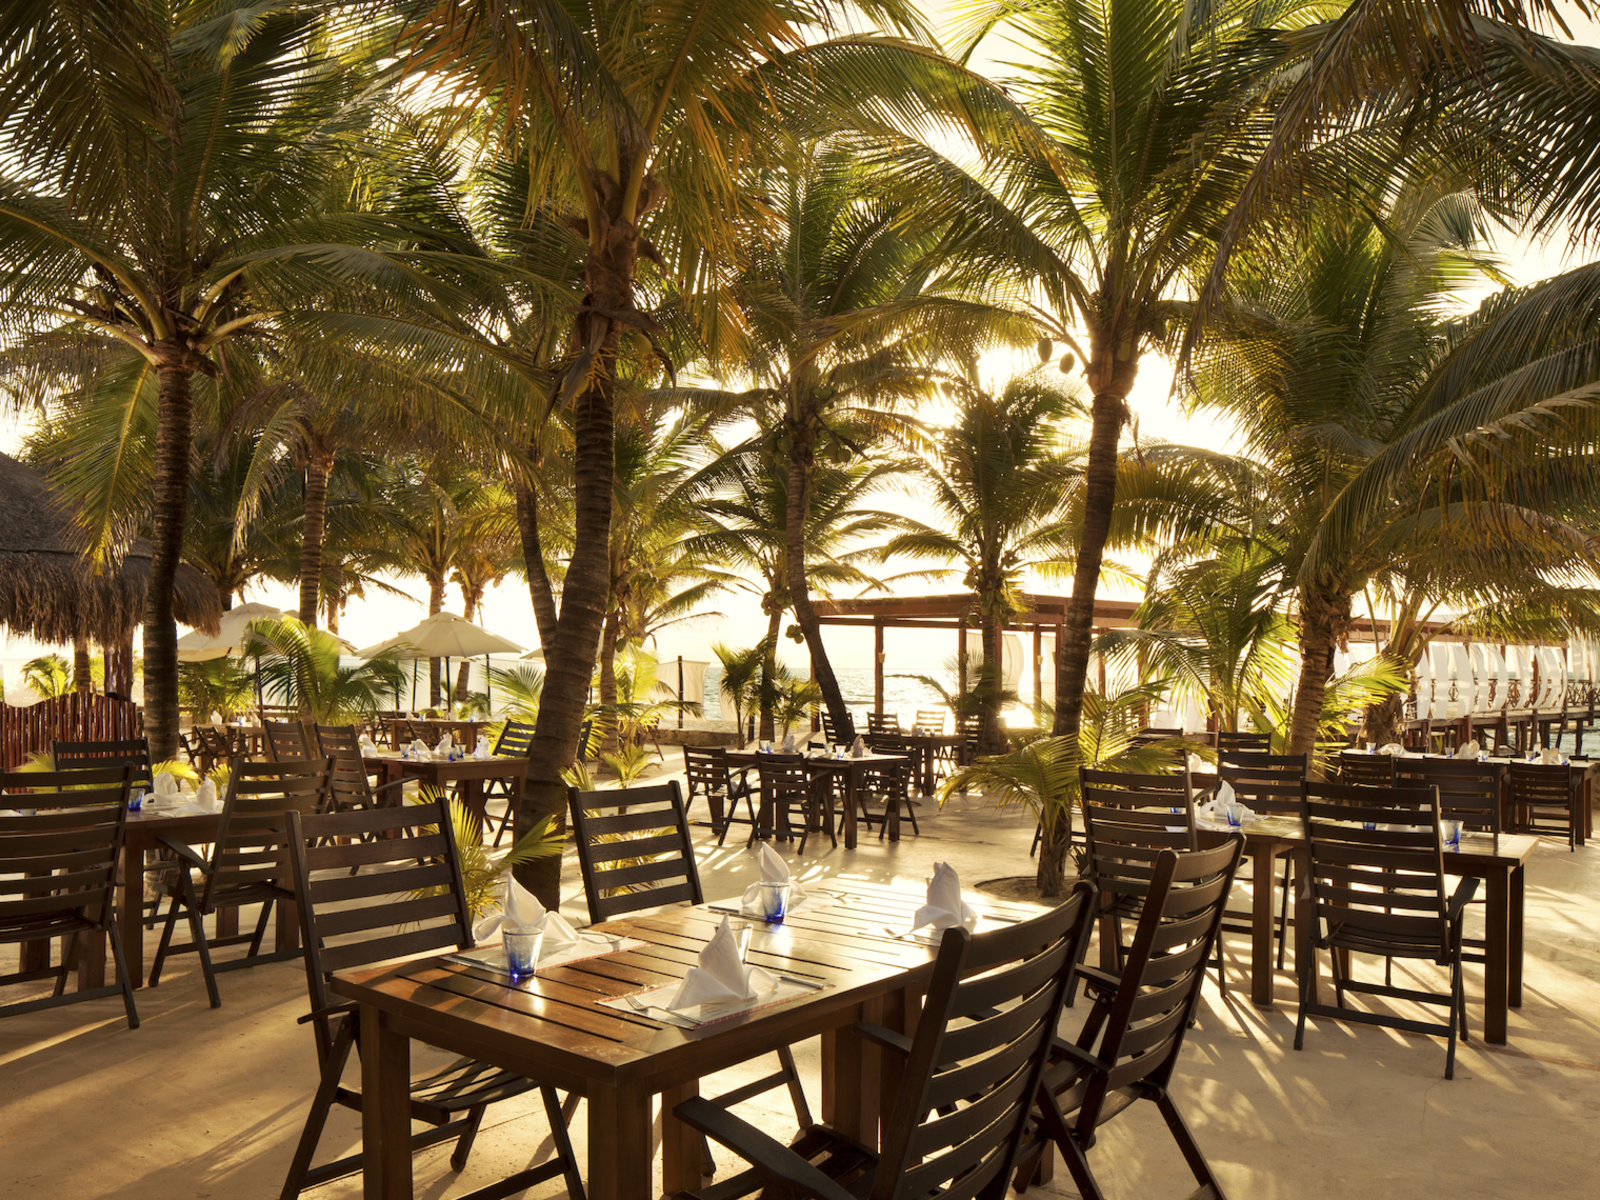 Jojo's Restaurant & Beach Bar